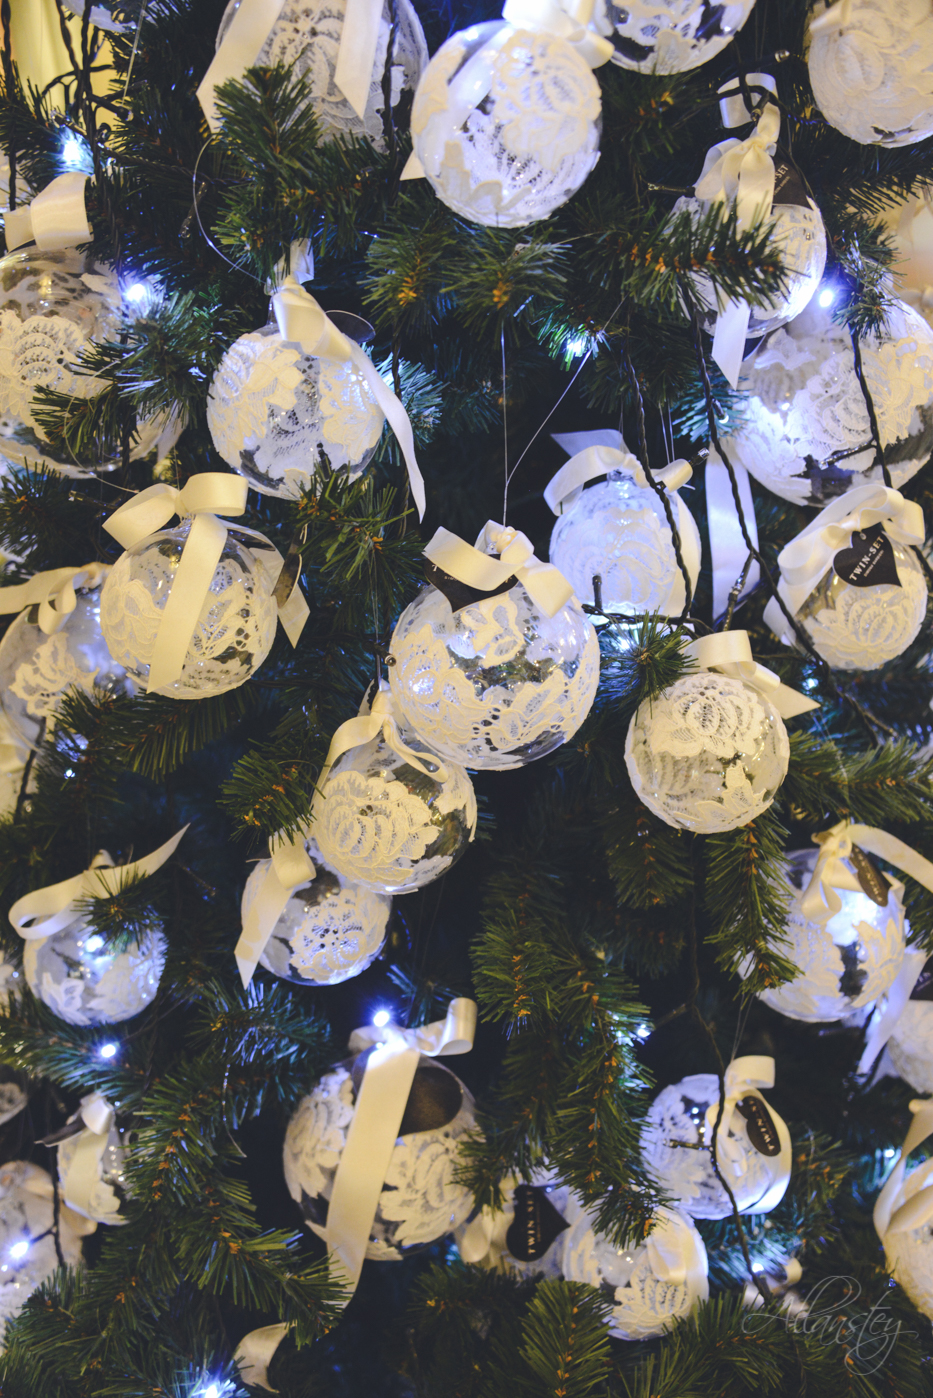 Christmas tree lights and decorations